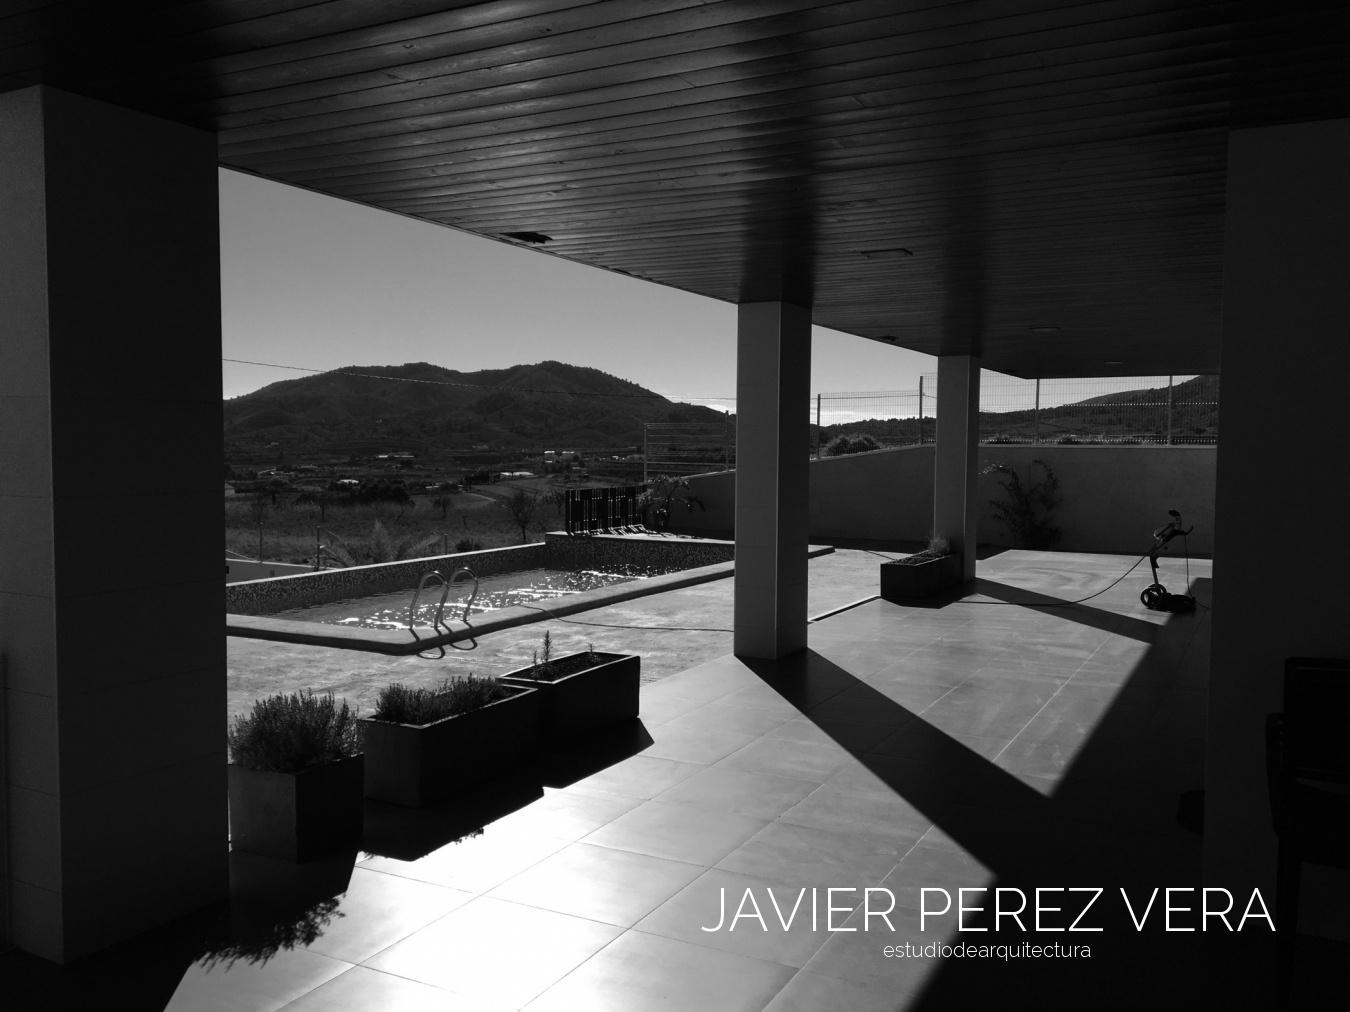 CASA LU - JAVIER PEREZ VERA, estudiodearquitectura